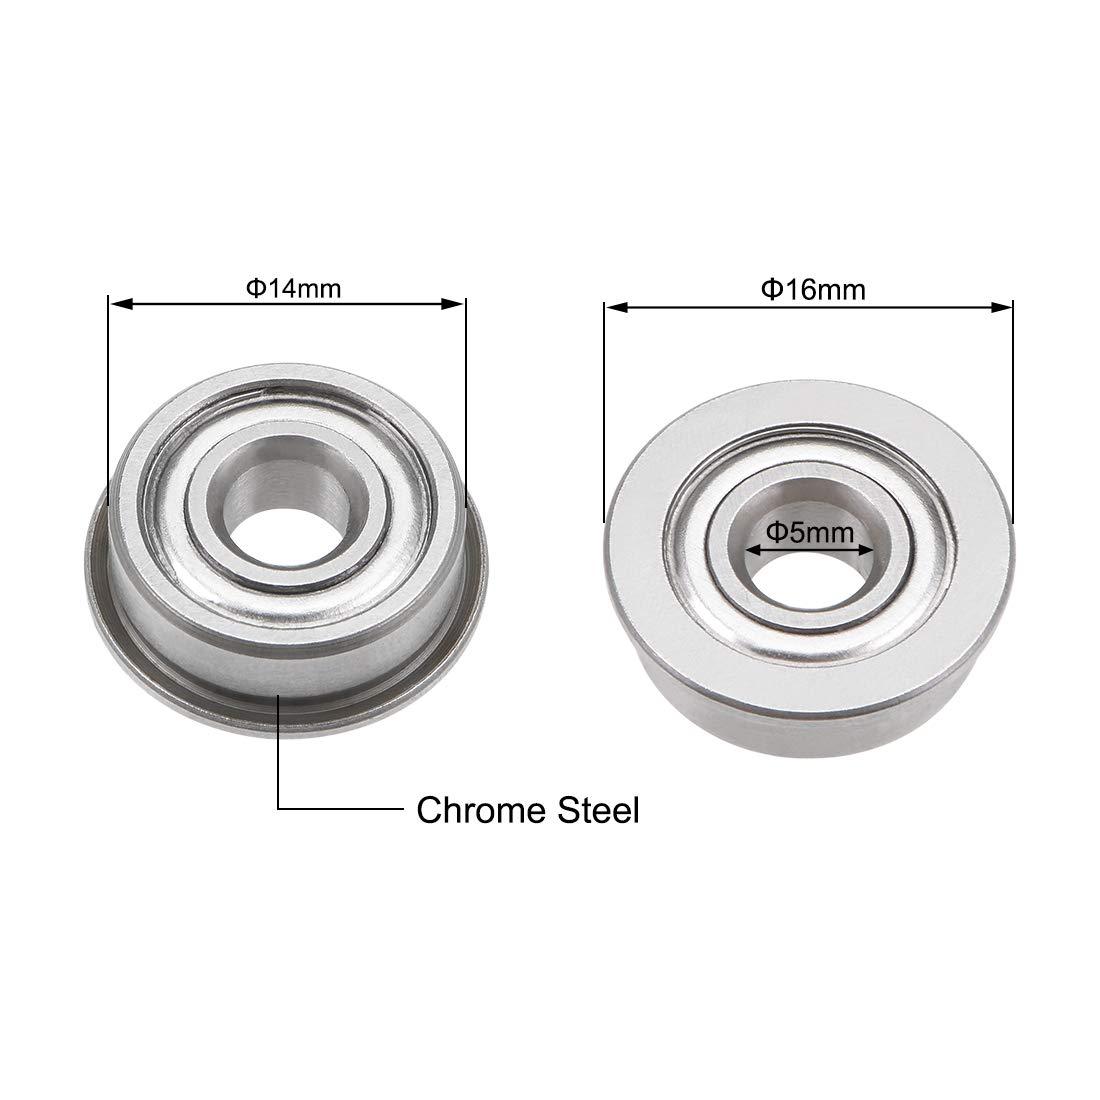 Chrome Steel Bearings 10pcs GCr15 uxcell F605ZZ Flange Ball Bearing 5x14x5mm Double Metal Shielded